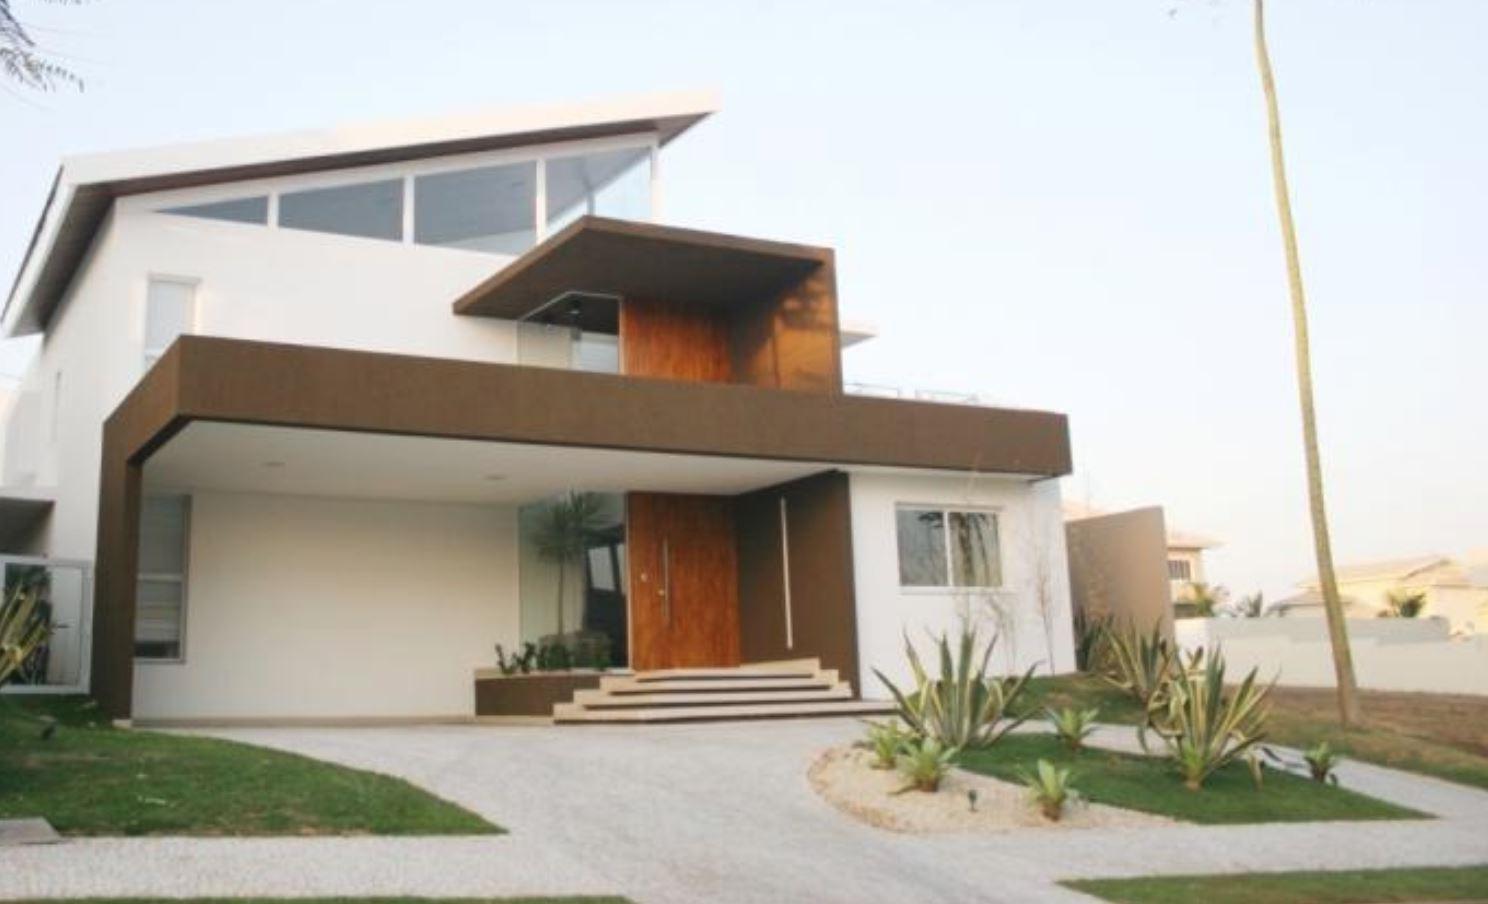 Frentes de casas bonitas for Casas medianas bonitas